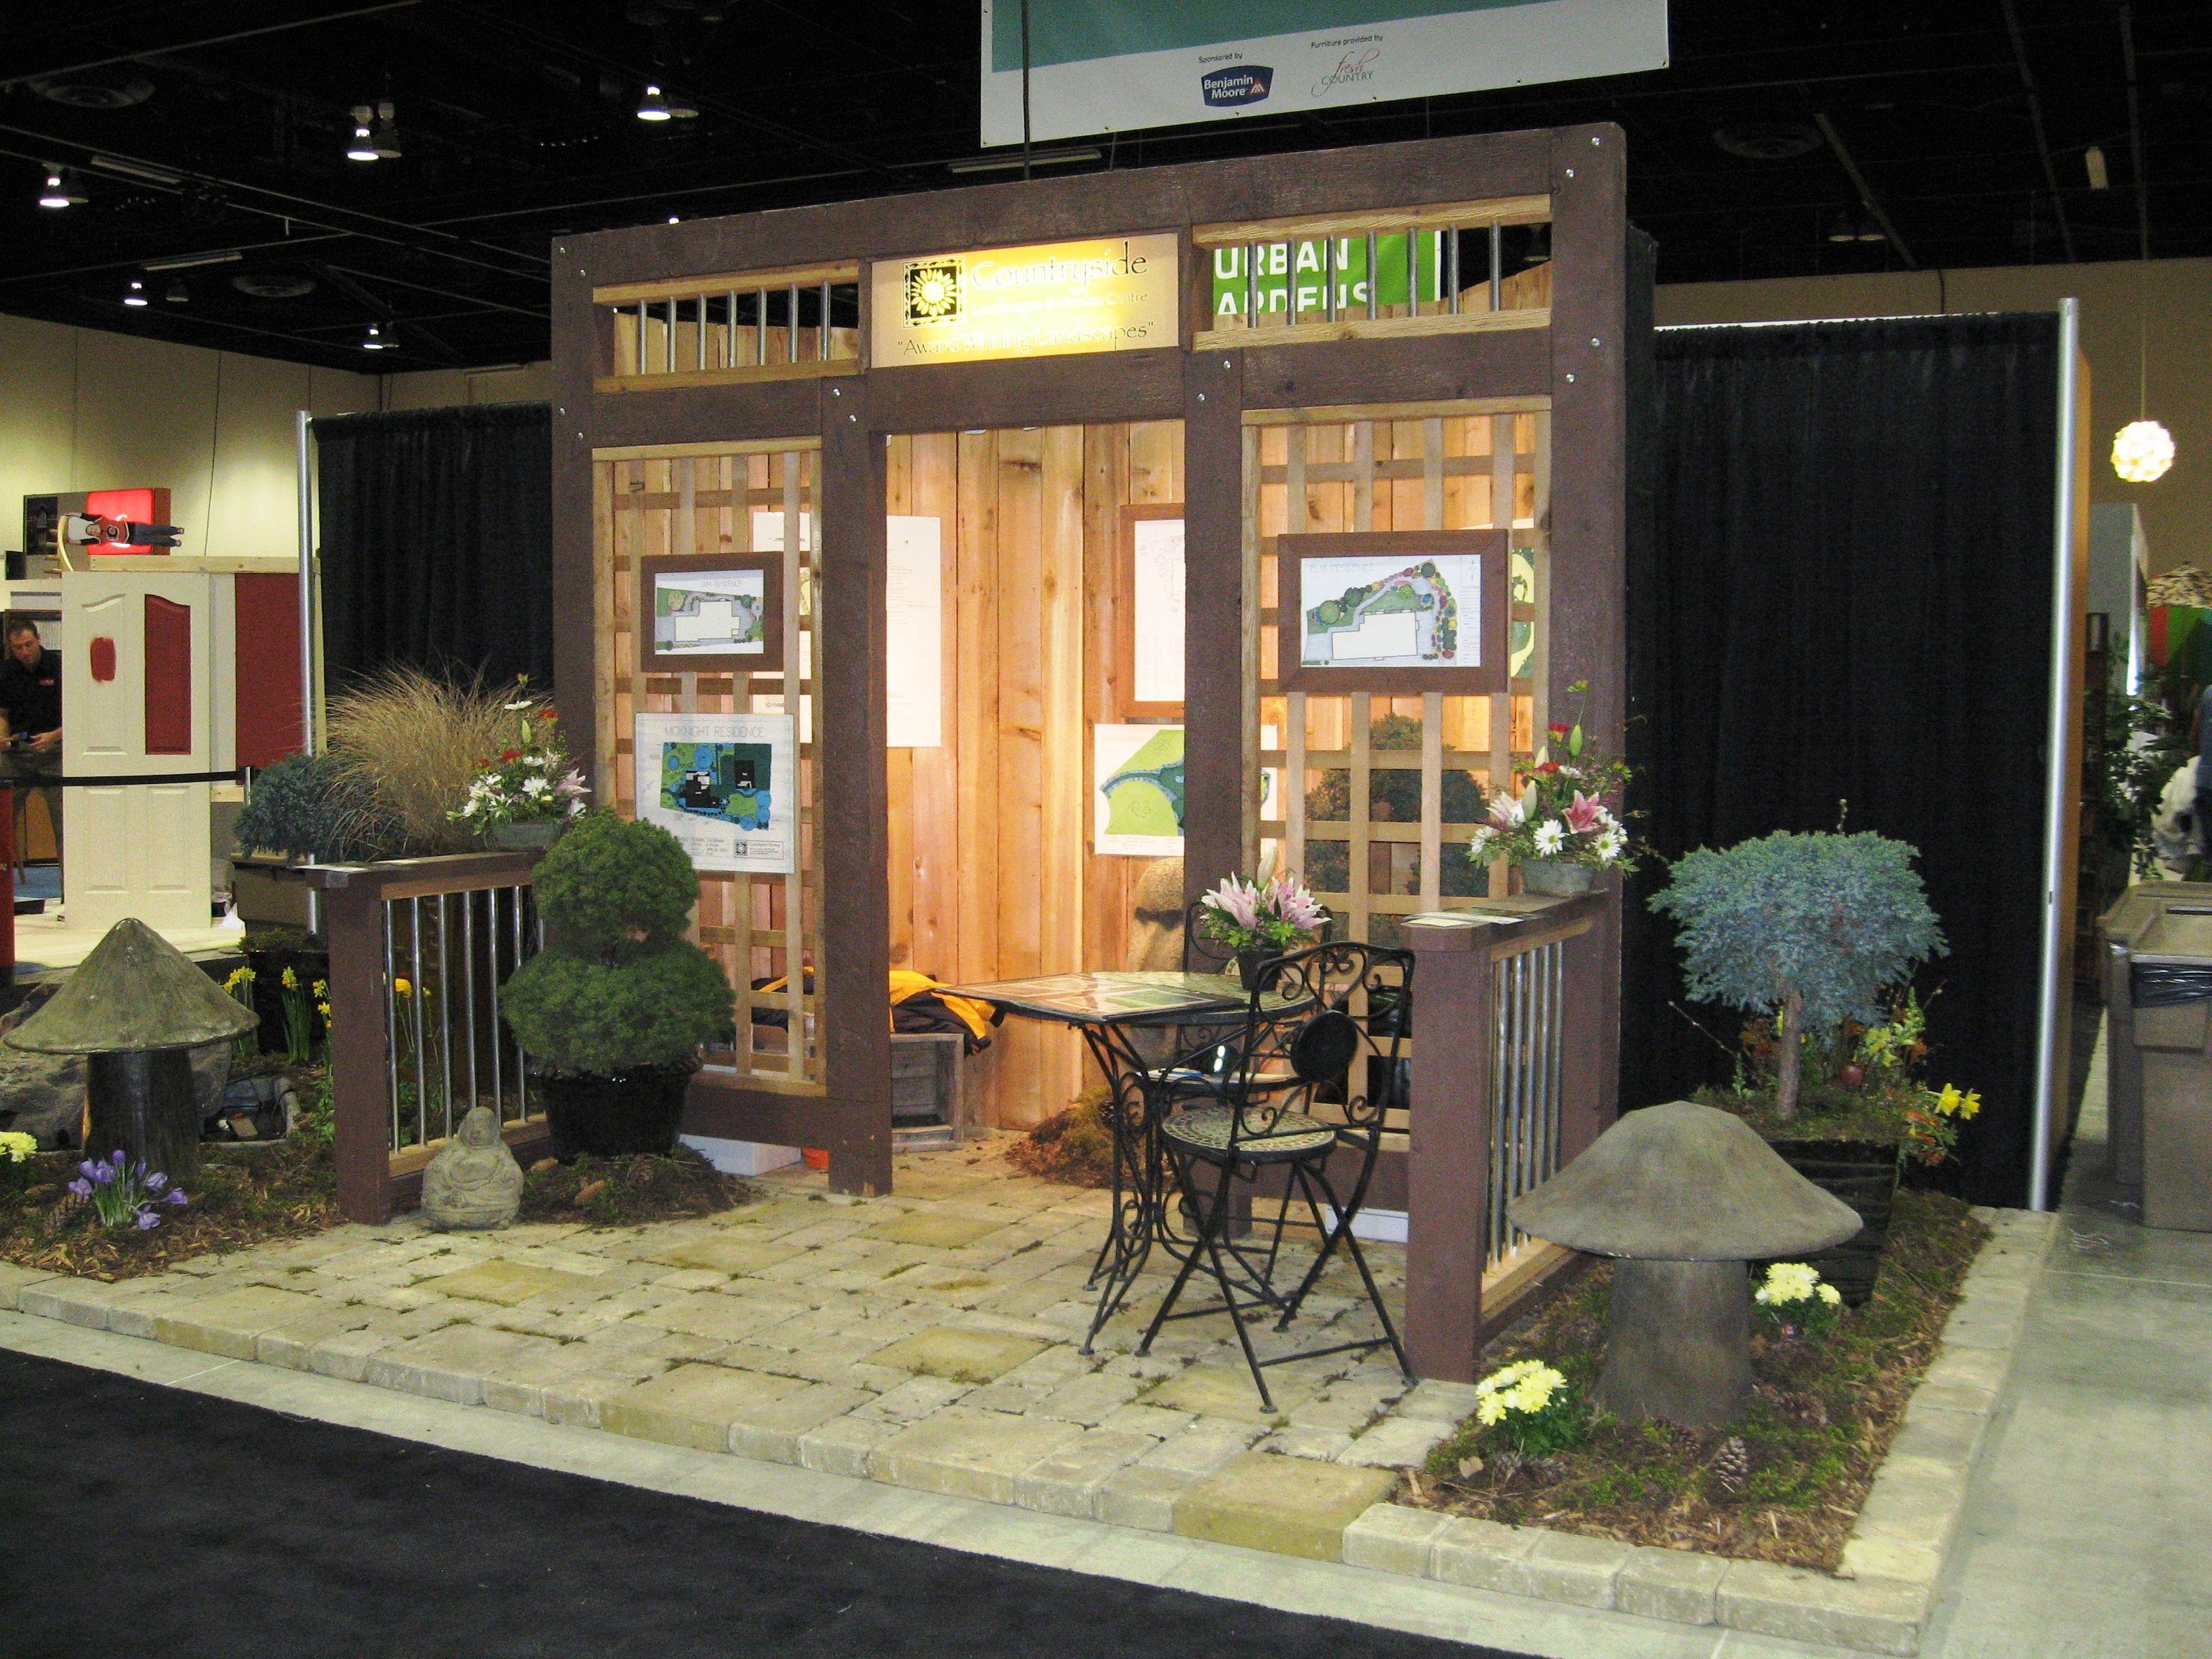 2007 Countryside Garden Centre Presents At The Home 400 x 300